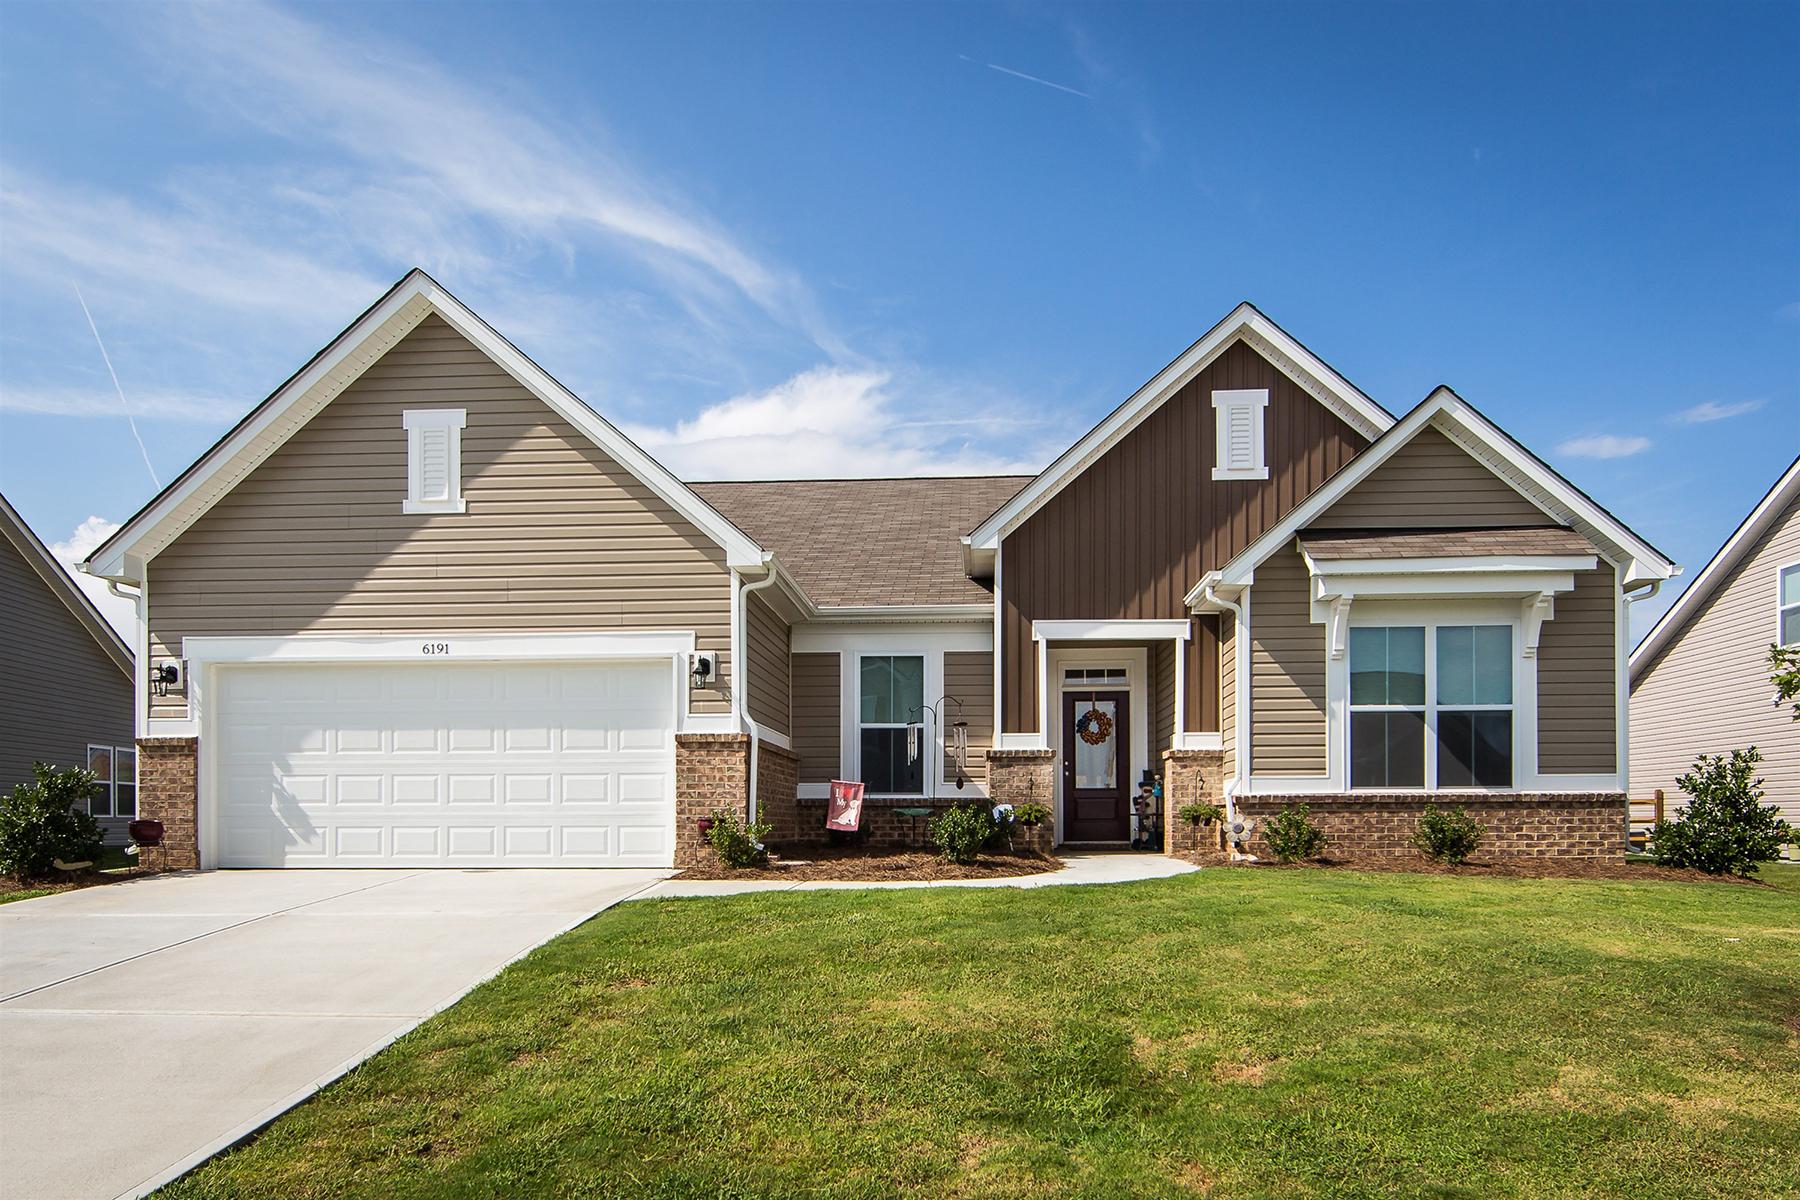 Single Family Home for Sale at VILLAGES OF DENVER 6191 Canyon Trl, Denver, North Carolina 28037 United States